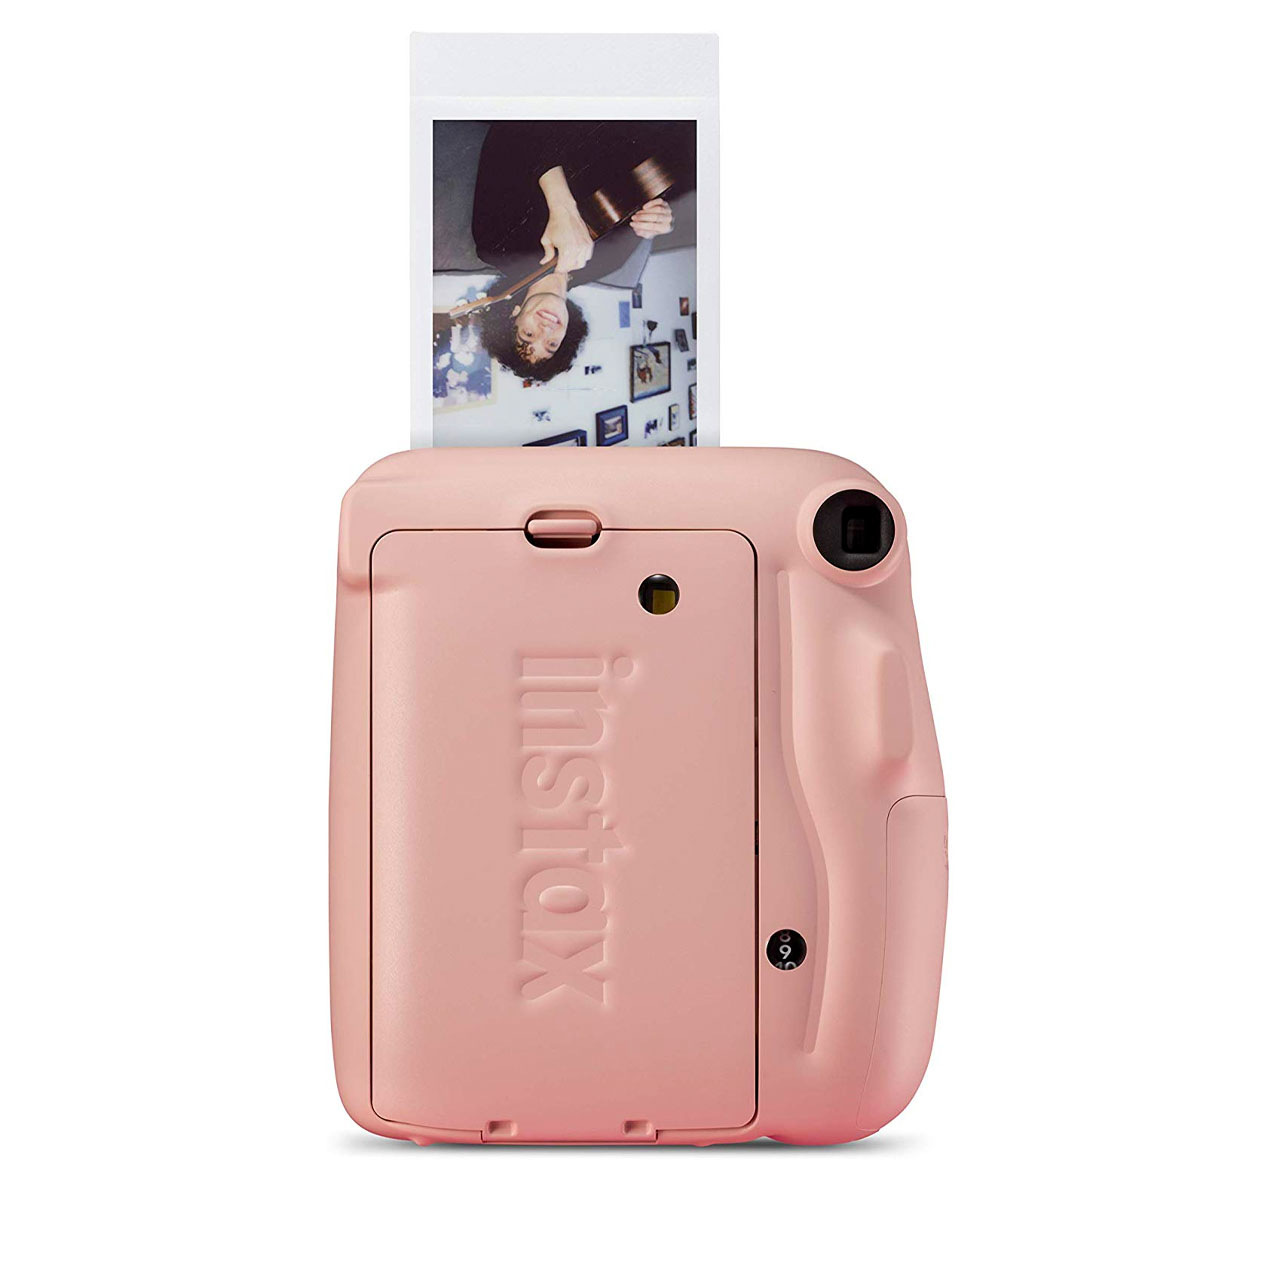 Fuji Instax Cámara Instantánea MINI 11 Blush Pink